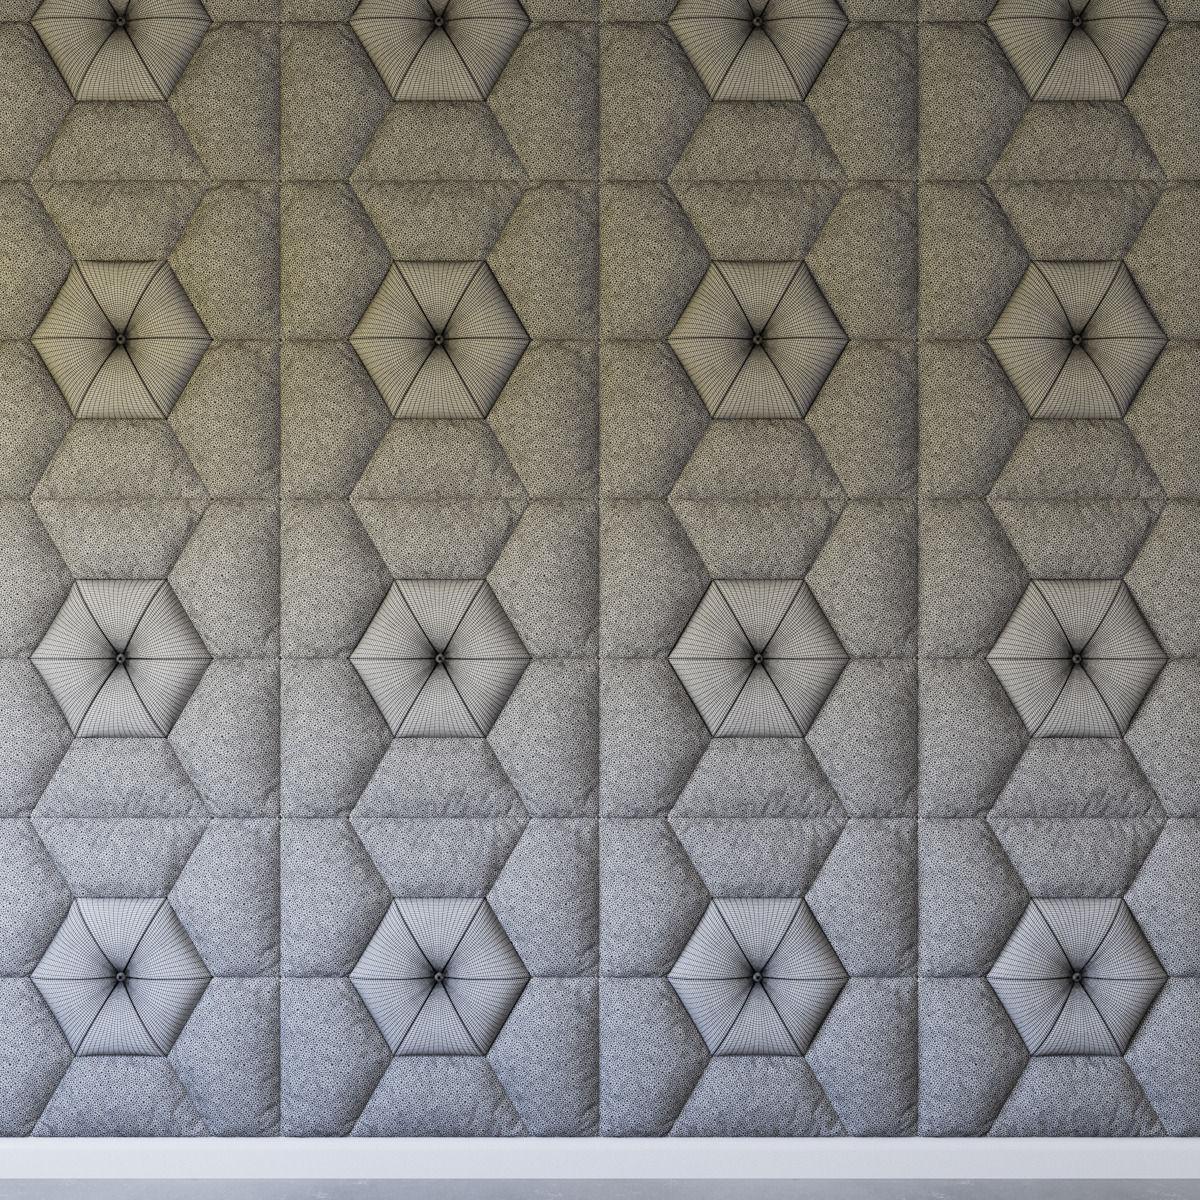 3D Decorative wall pattern panel   CGTrader